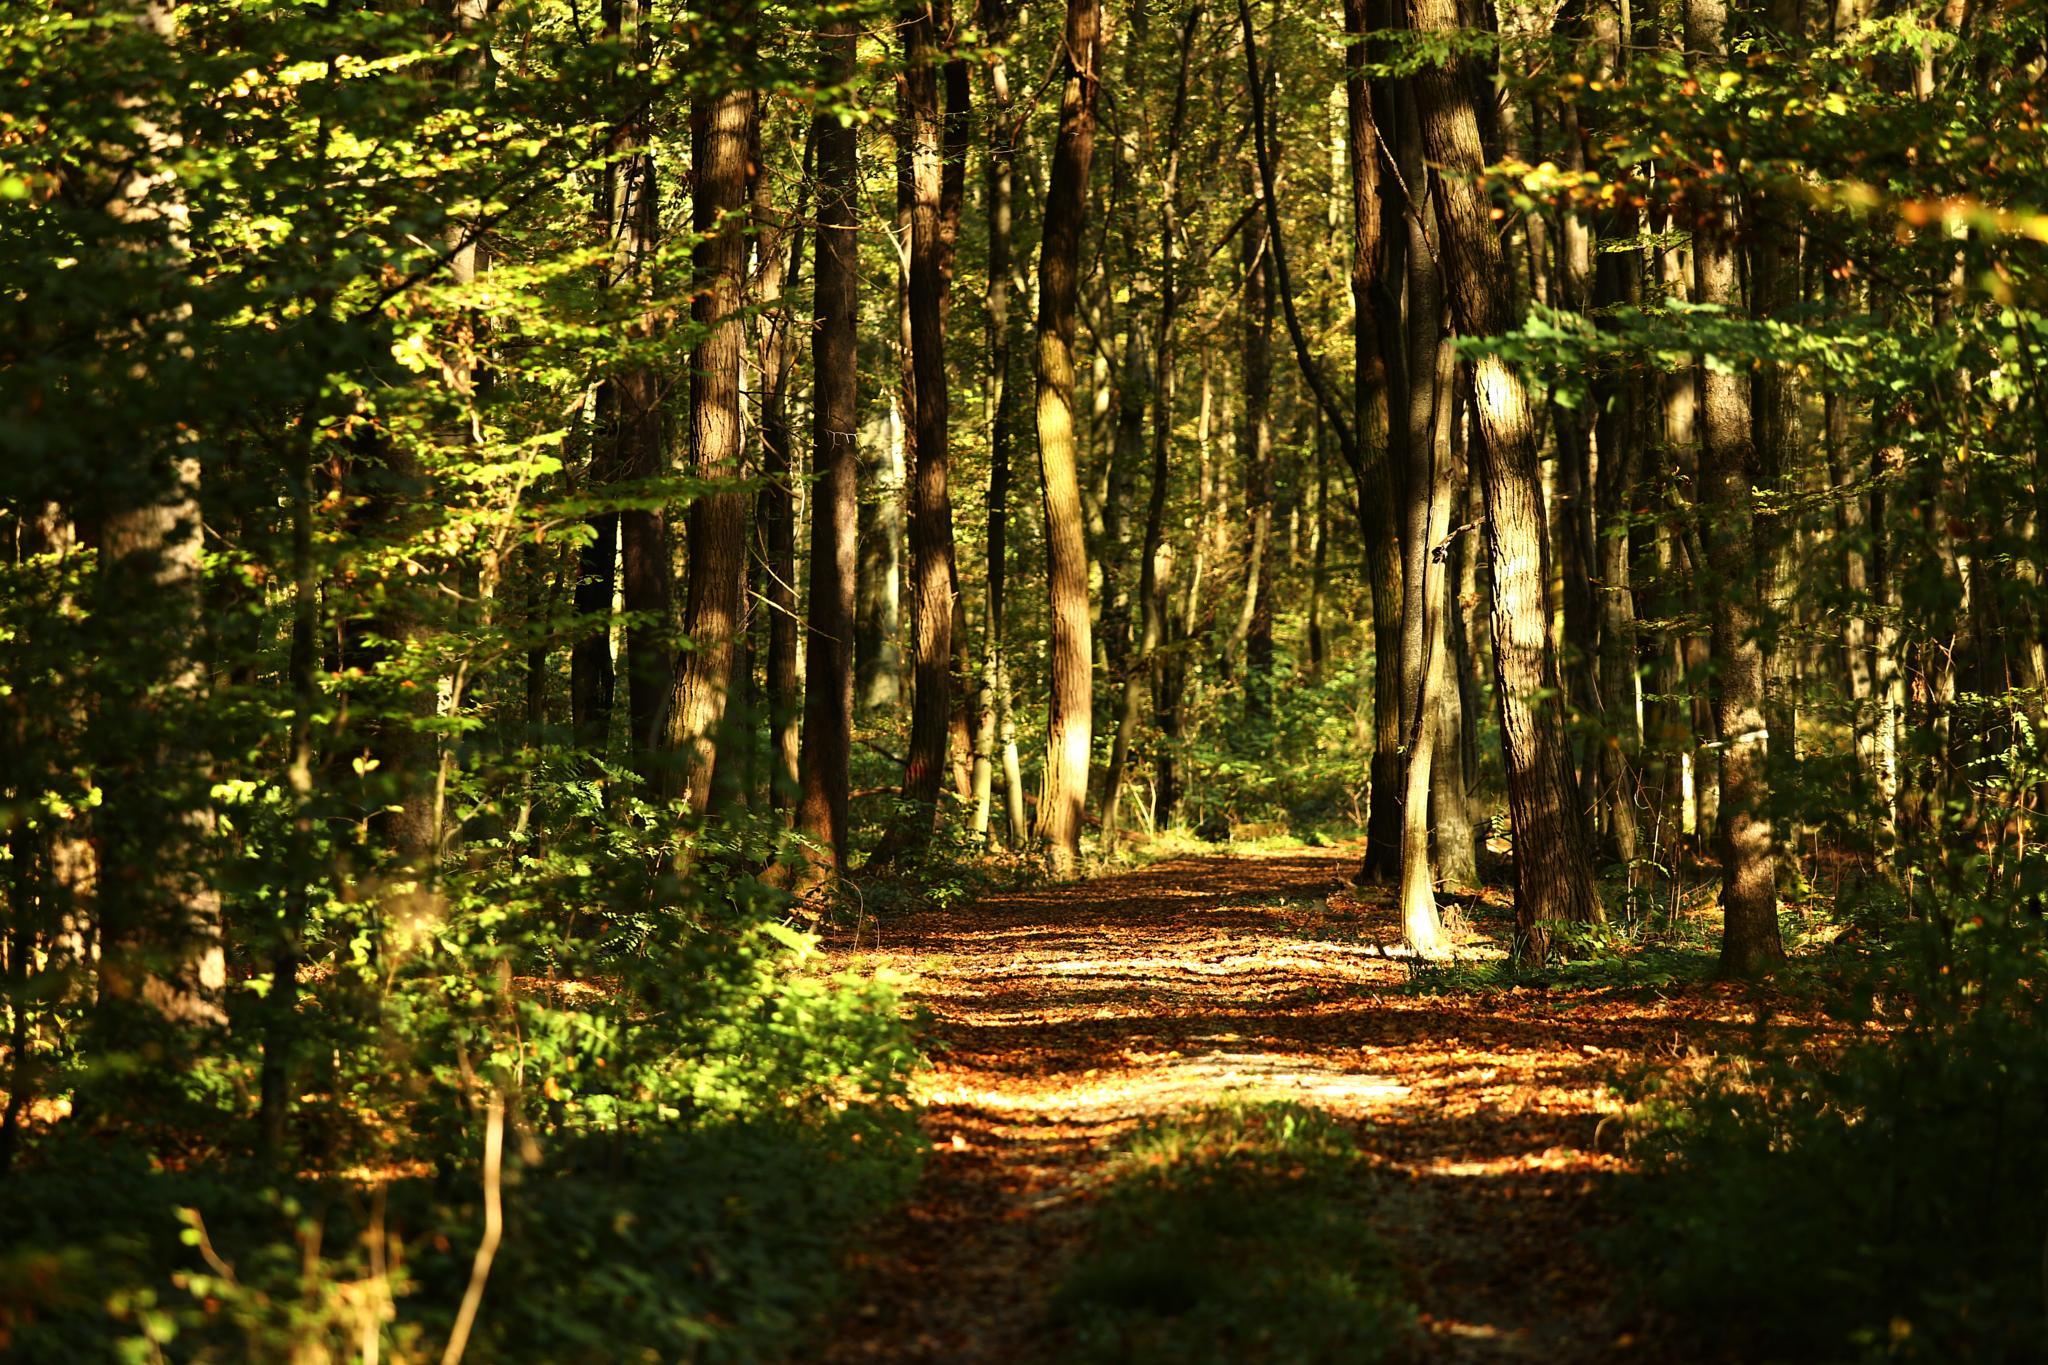 jesen v gozdu by tatjanamijatovi